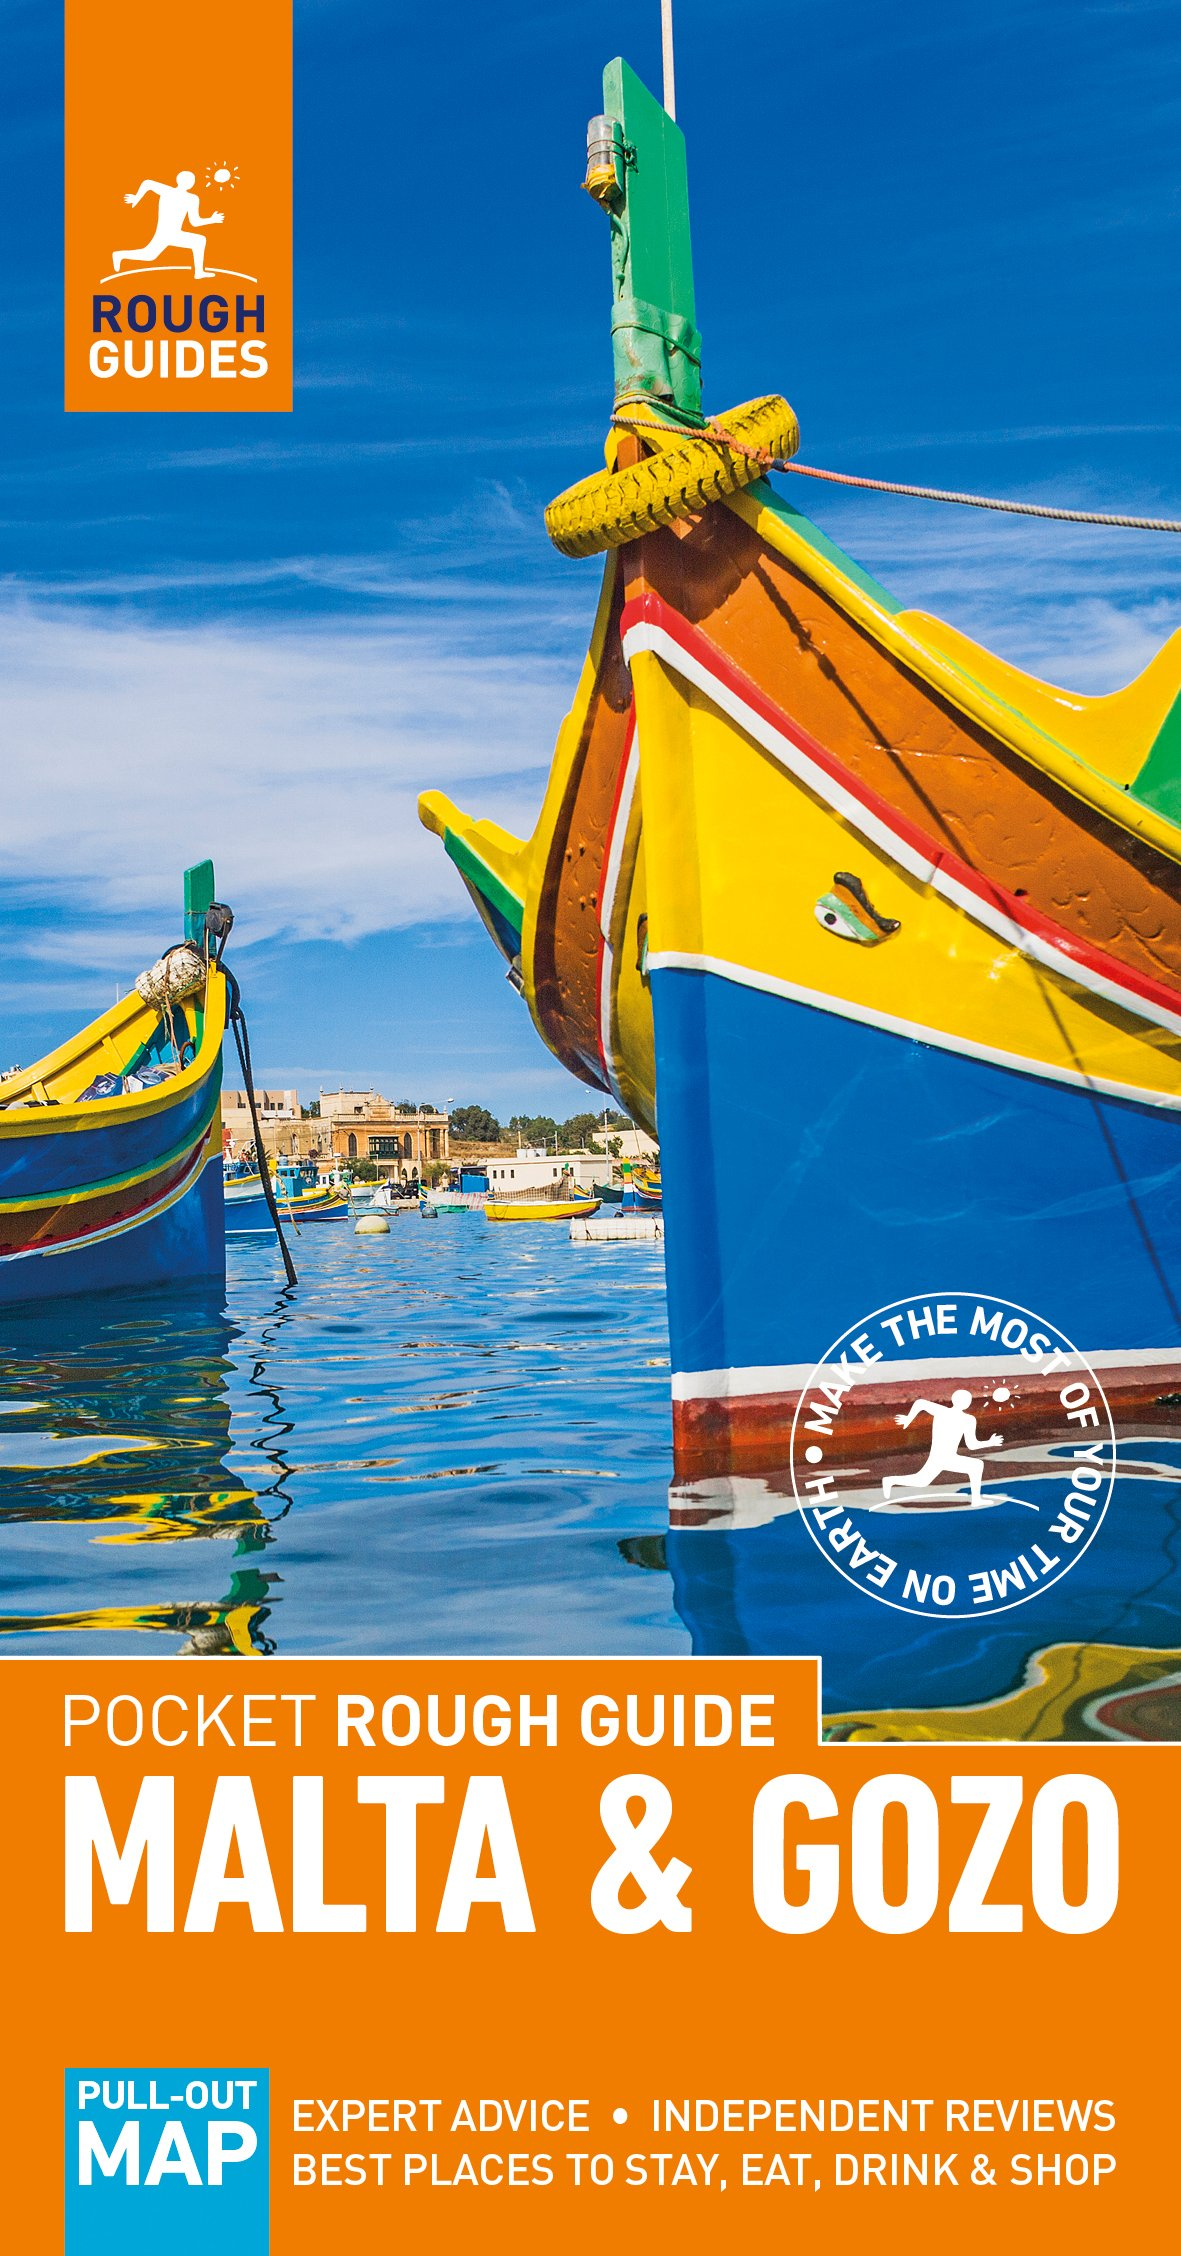 Pocket Rough Guide Malta & Gozo (Rough Guide Pocket Guides)